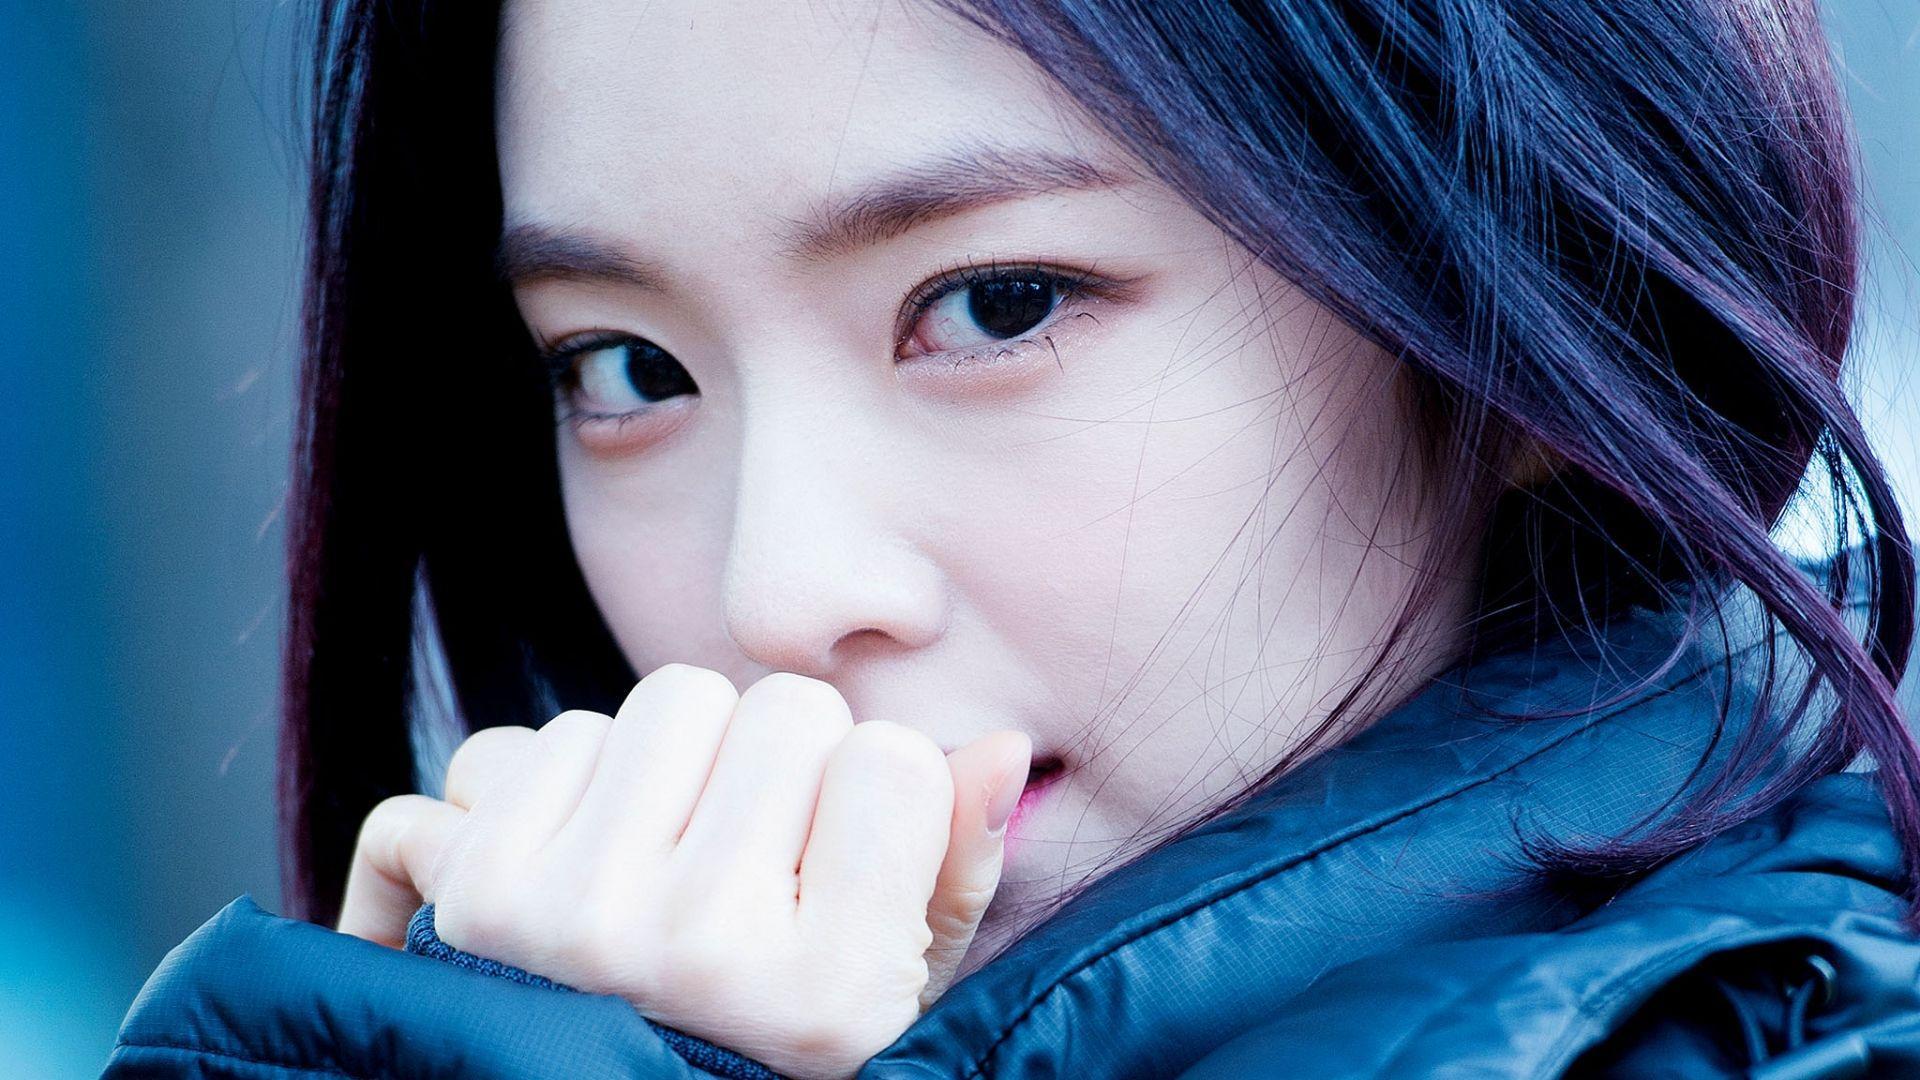 Red Velvet Irene Pc Wallpapers Top Free Red Velvet Irene Pc Backgrounds Wallpaperaccess